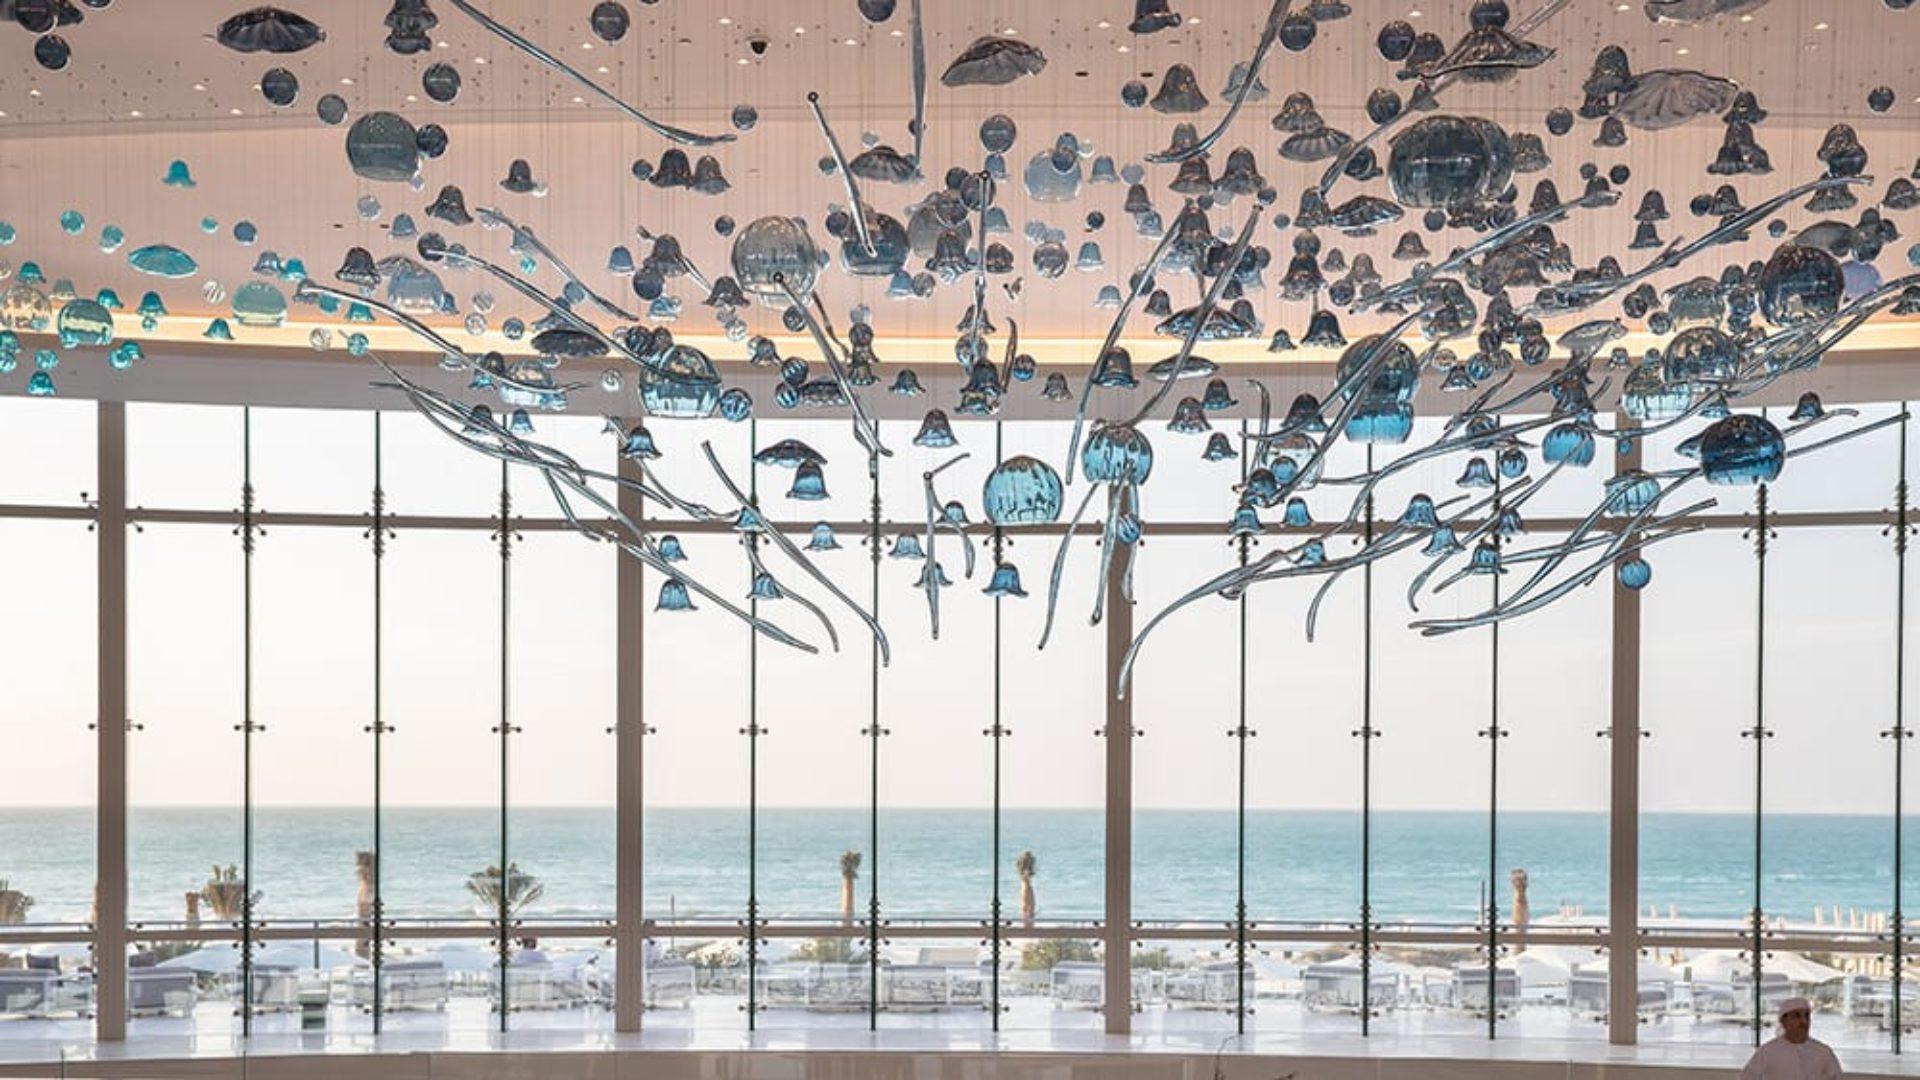 Art in the lobby of Jumeirah at Saadiyat Island